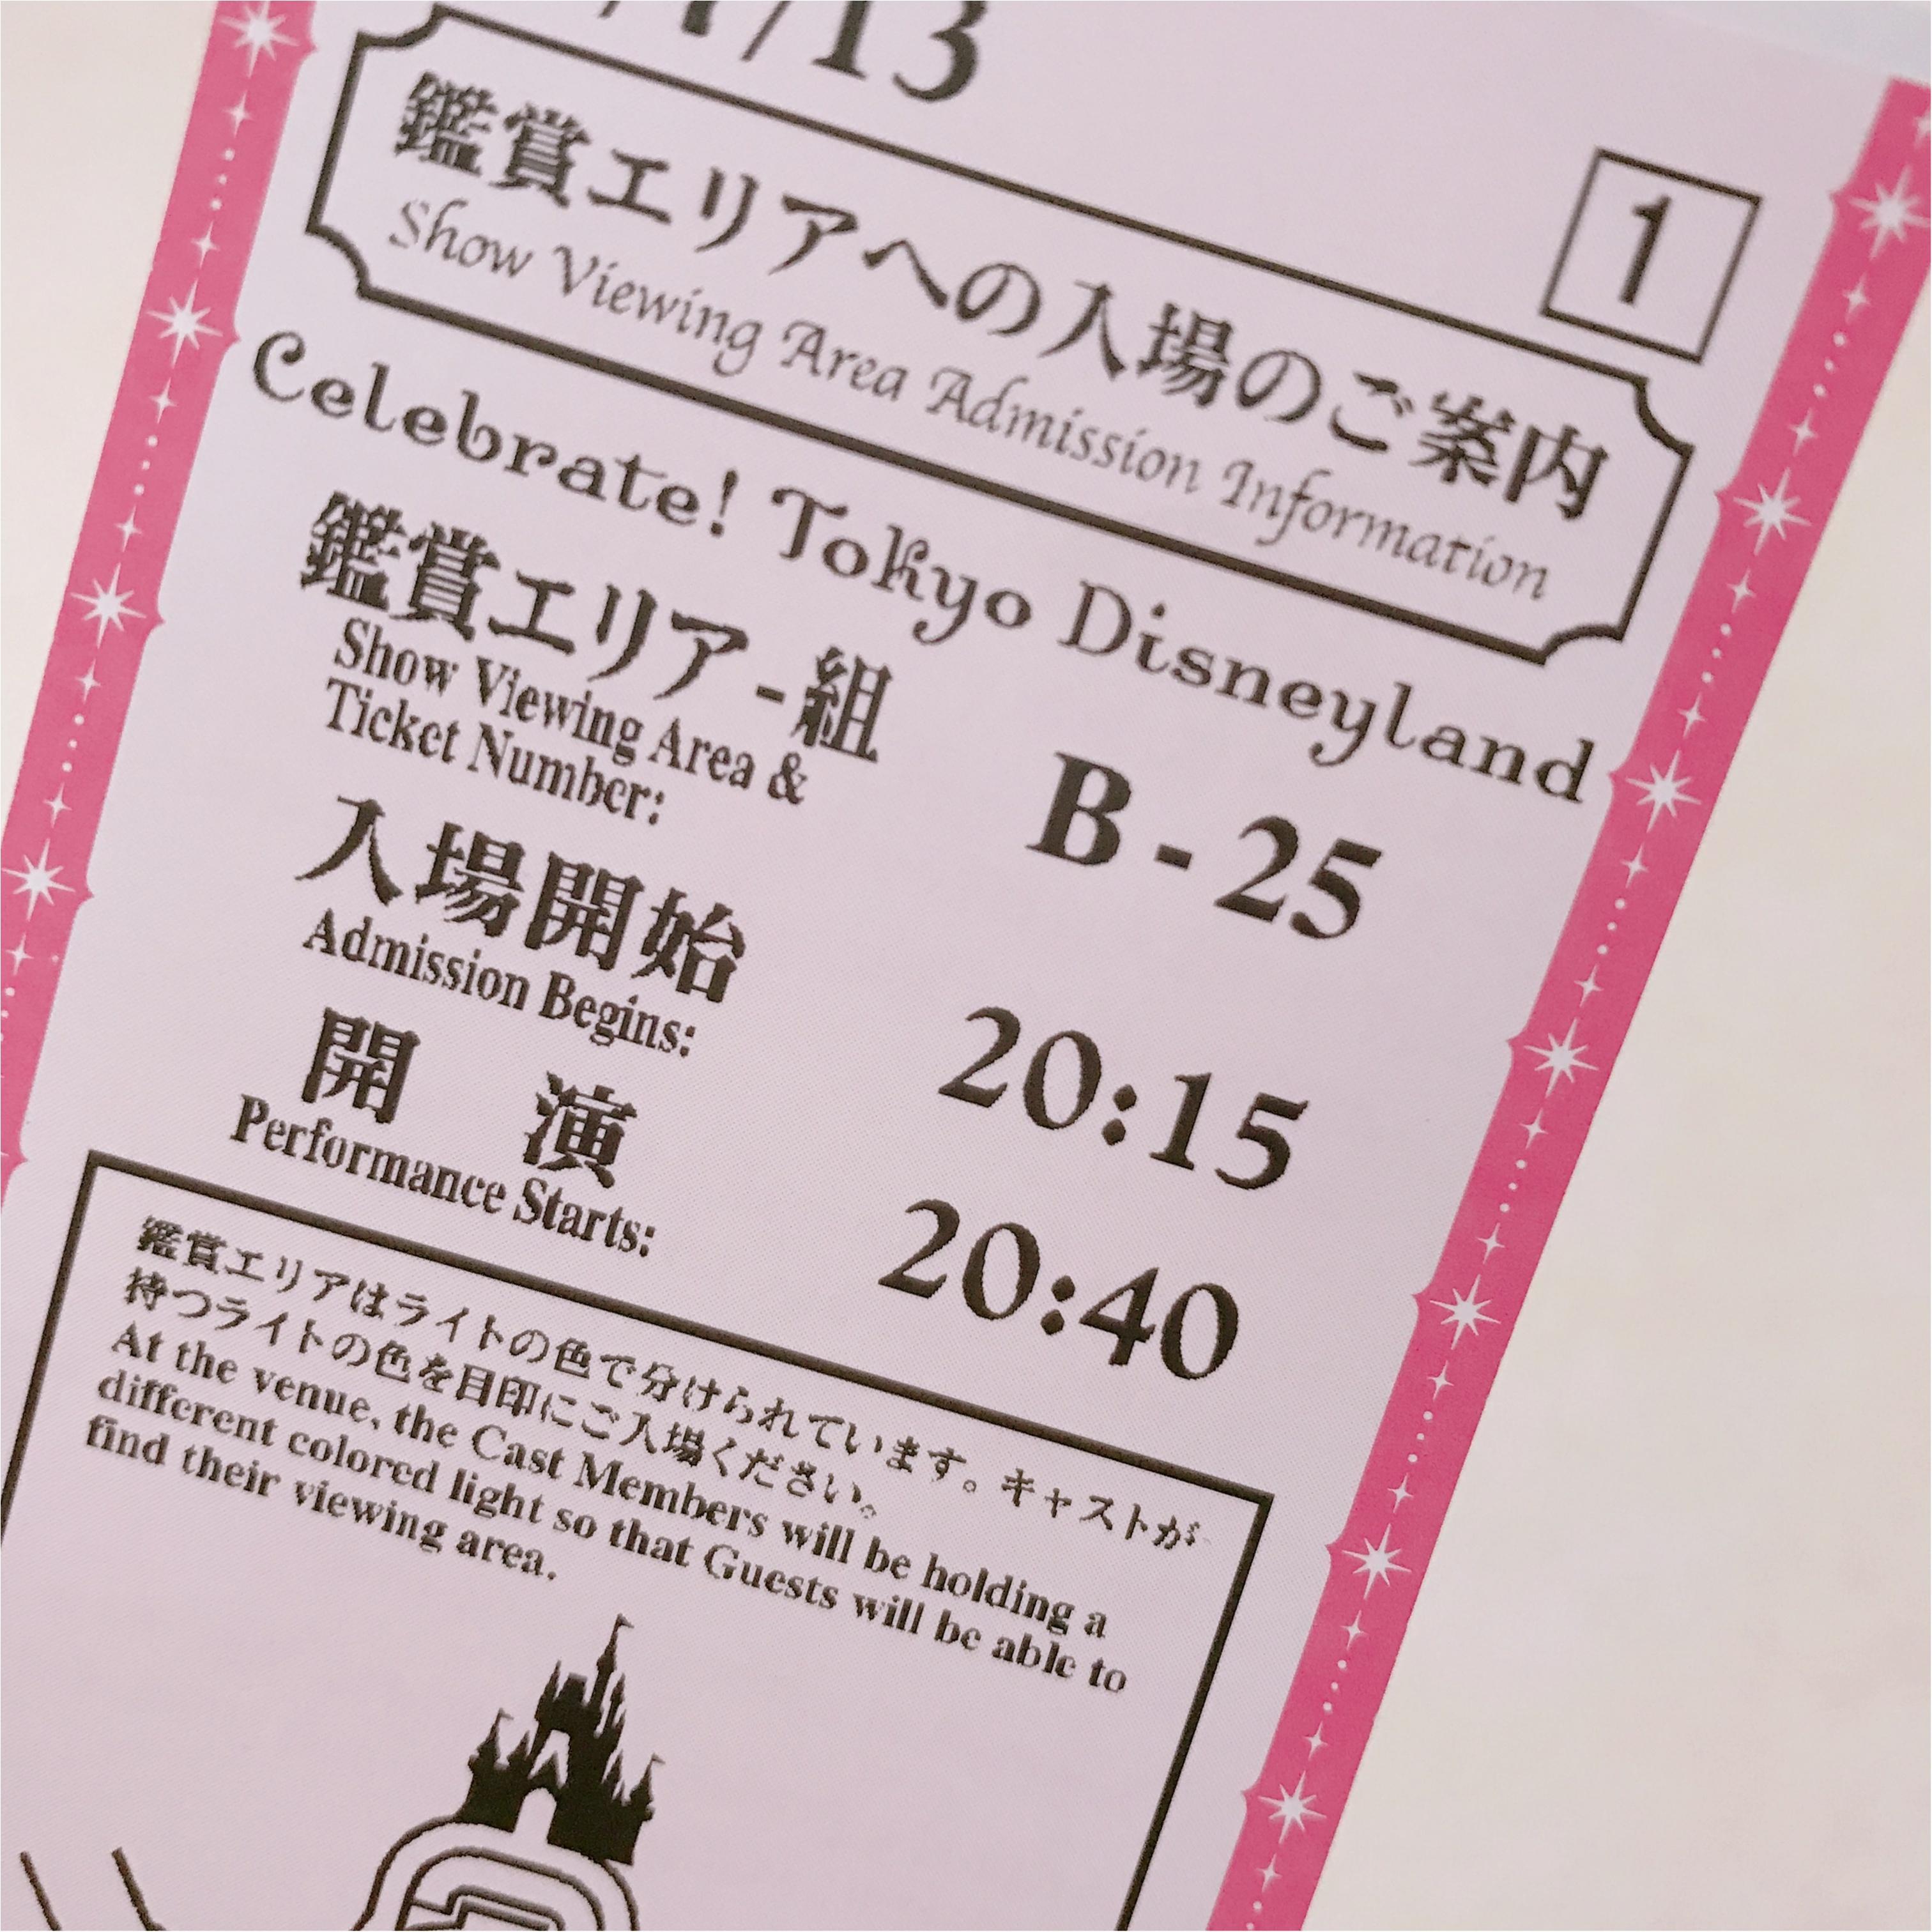 【Celebrate!Tokyo Disneyland】に当選したら絶対に知っておくべきポイントとは❤︎_2